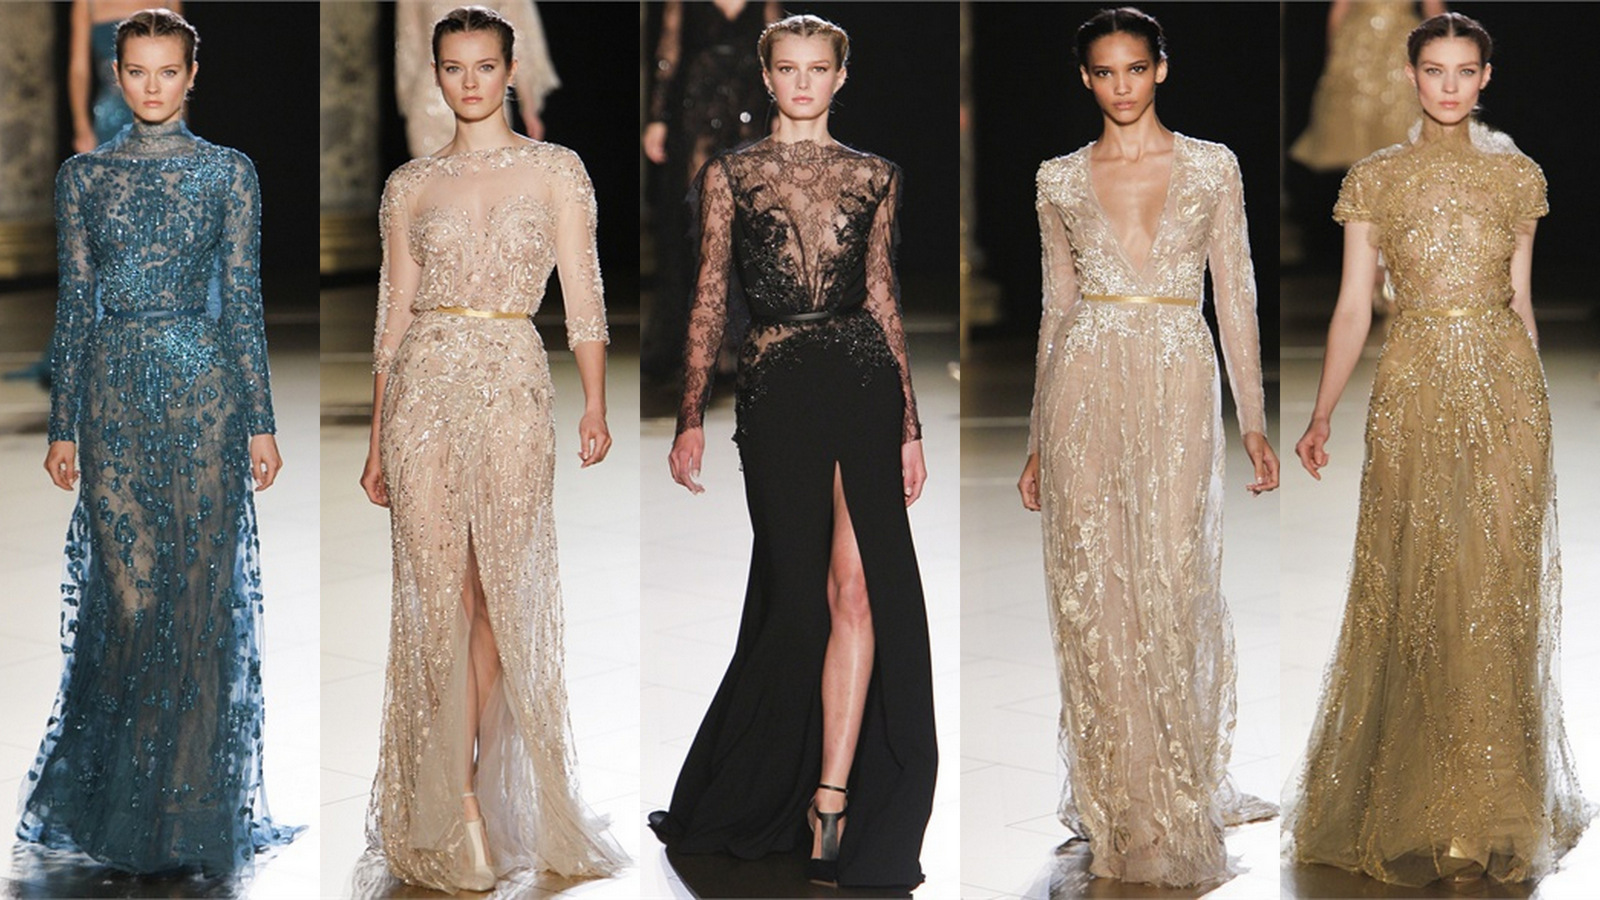 Elie Saab Haute Couture 2013